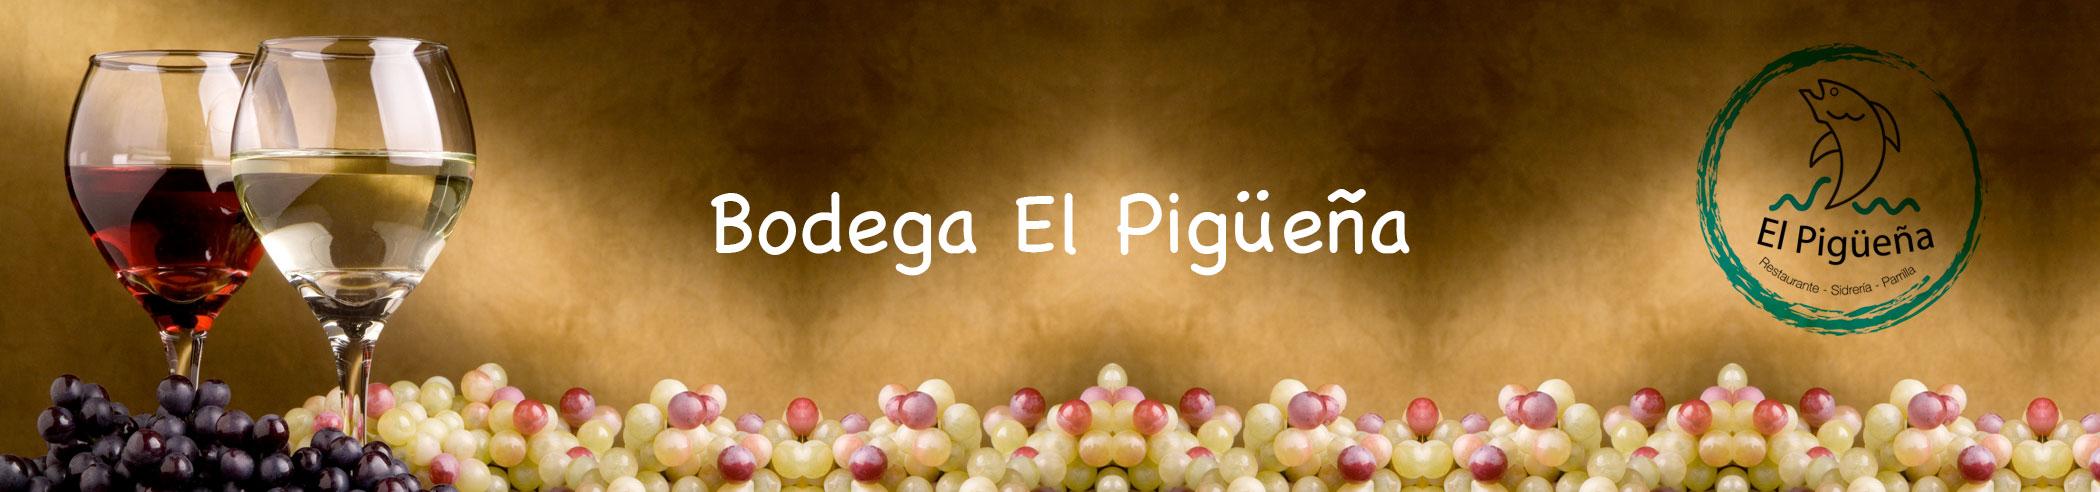 bodega-piguena